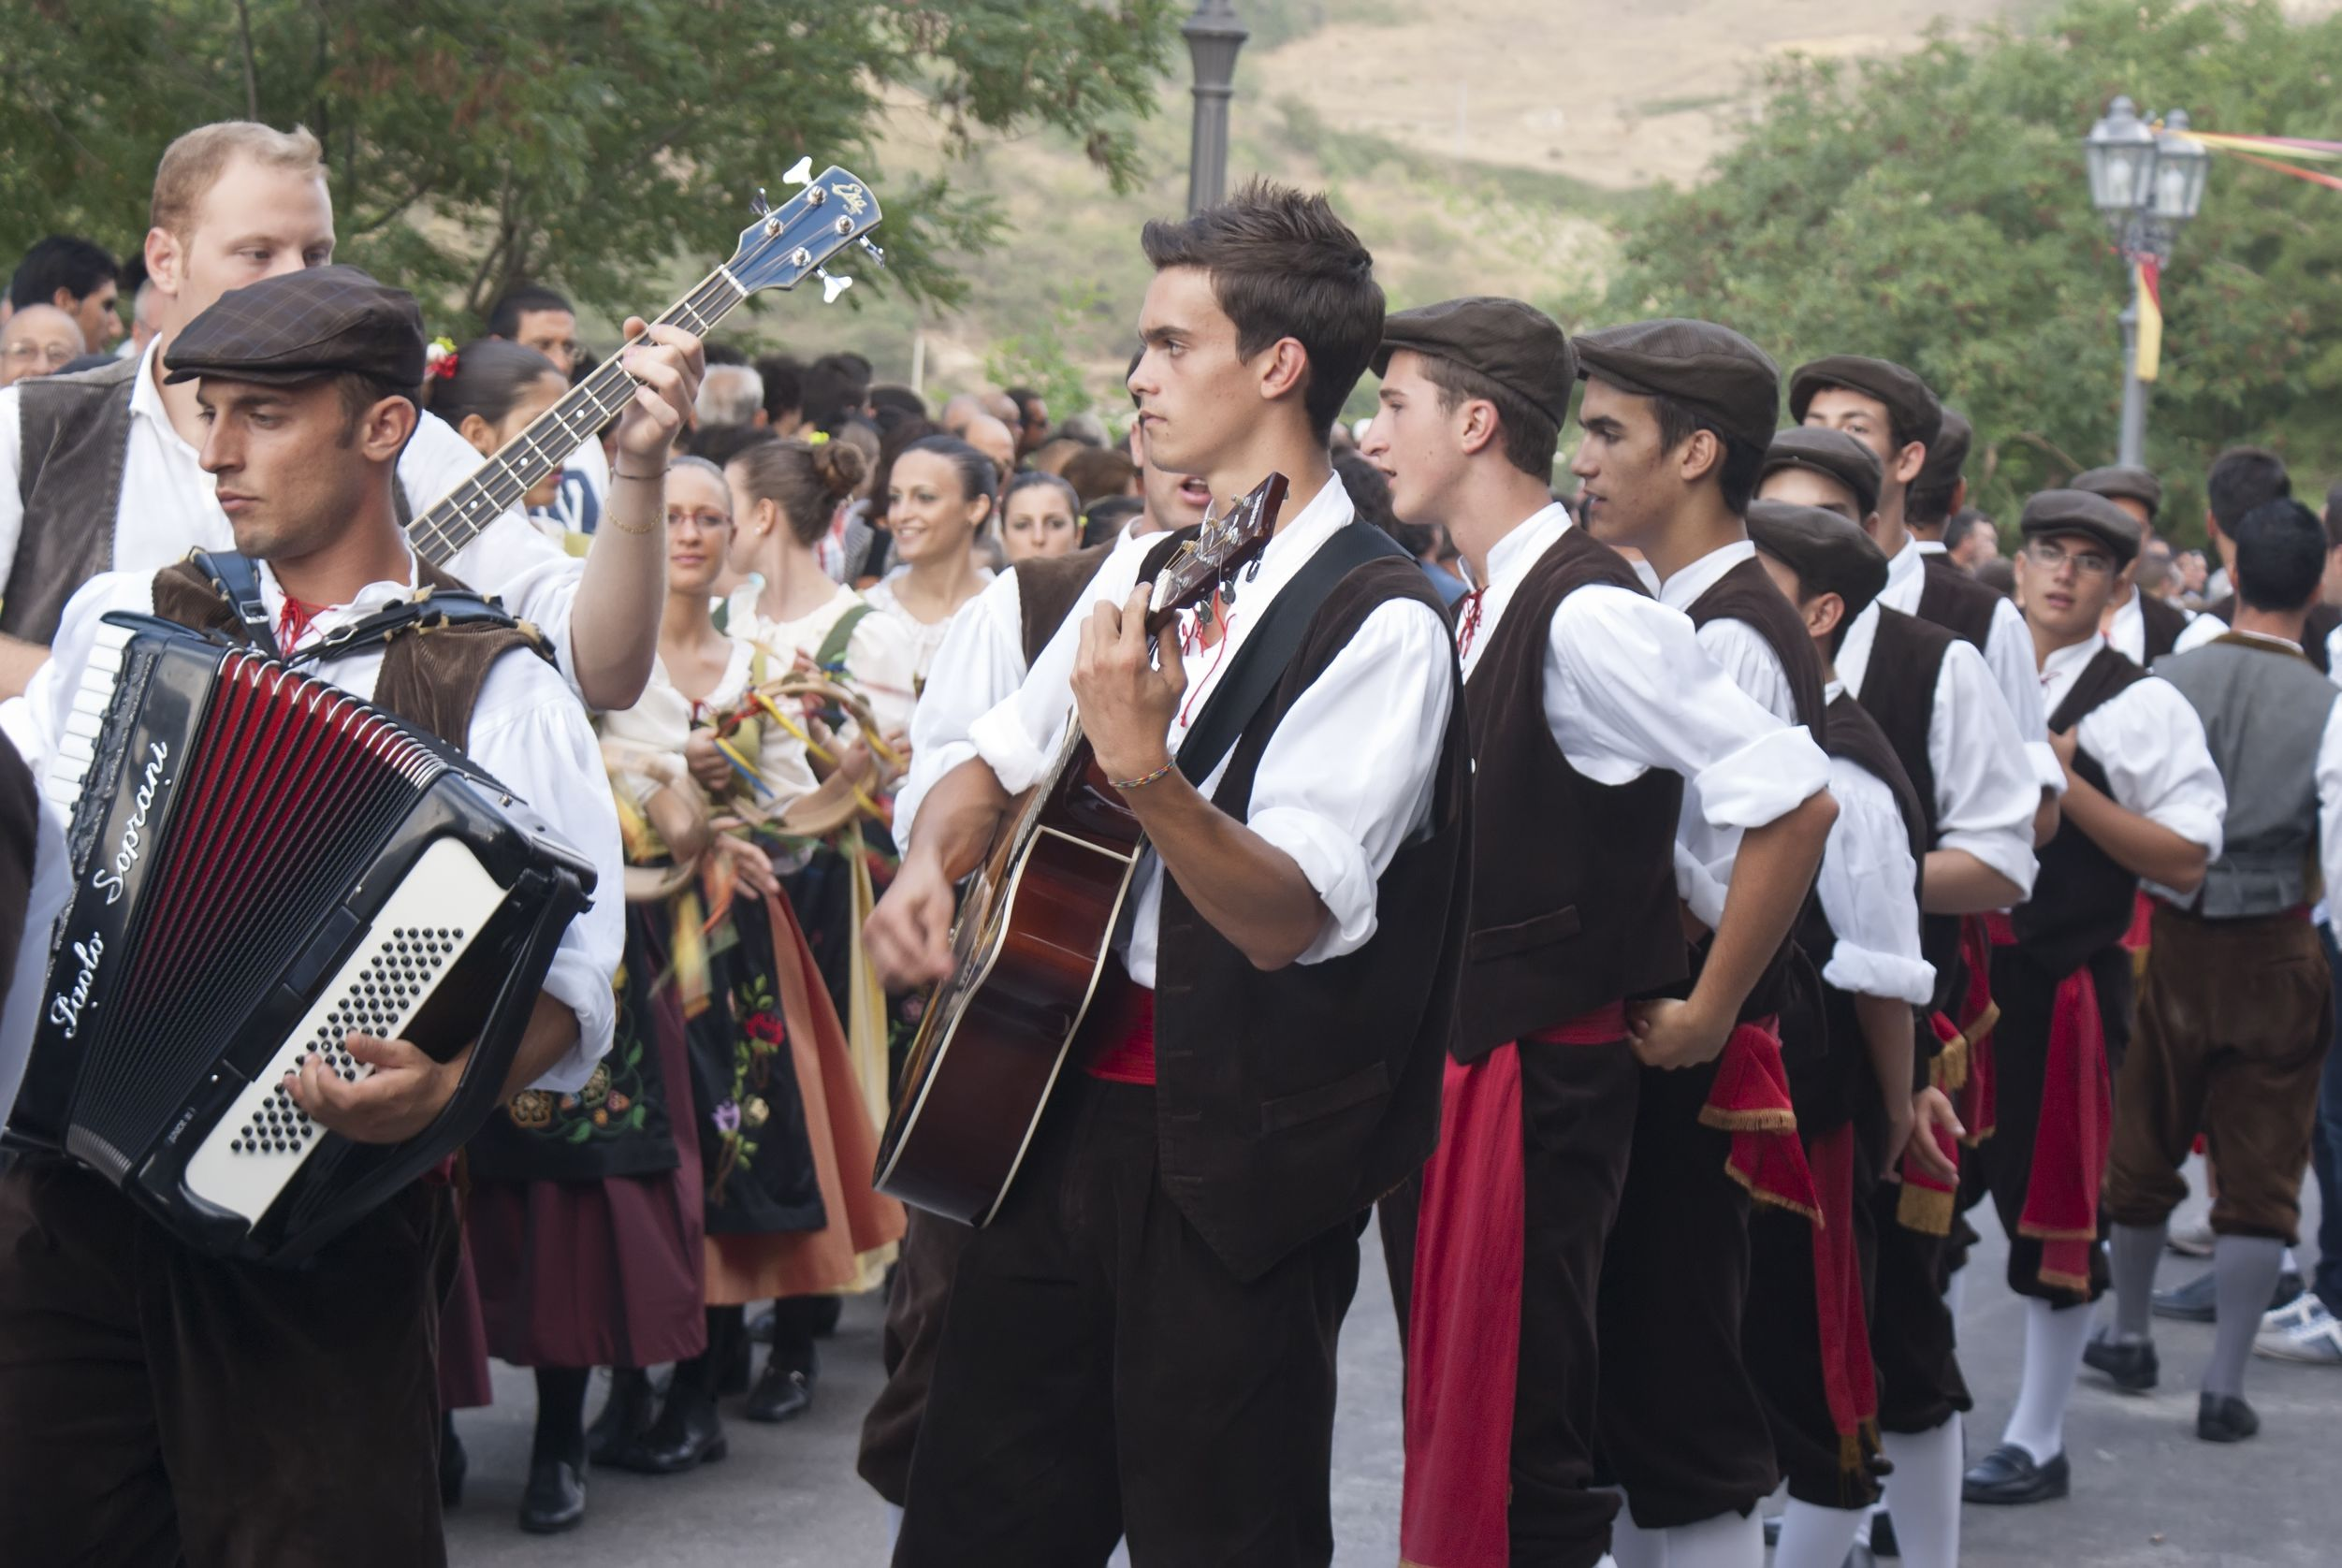 Sicily Ypsigrock summer music Festival in Italy